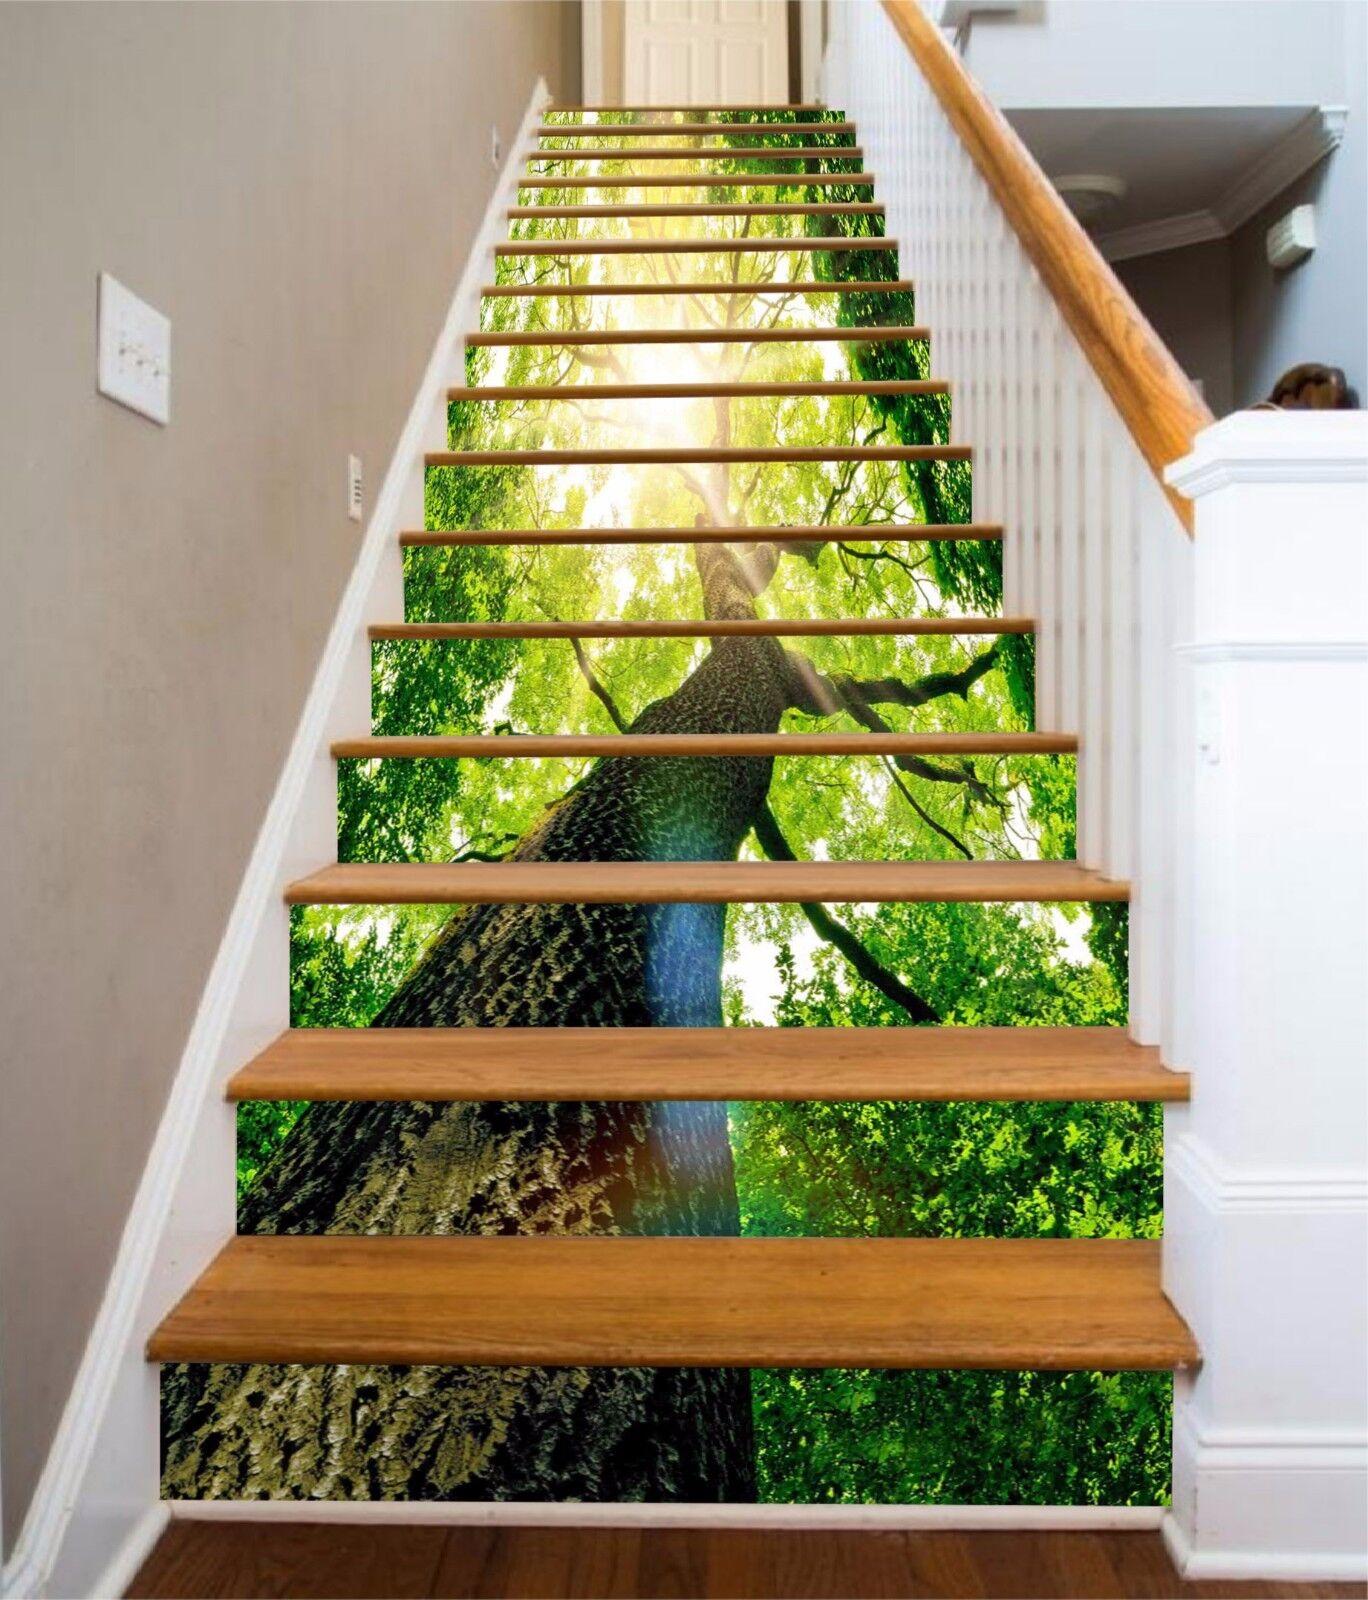 3D High Tree 779 Stair Risers Decoration Photo Mural Vinyl Decal Wallpaper AU